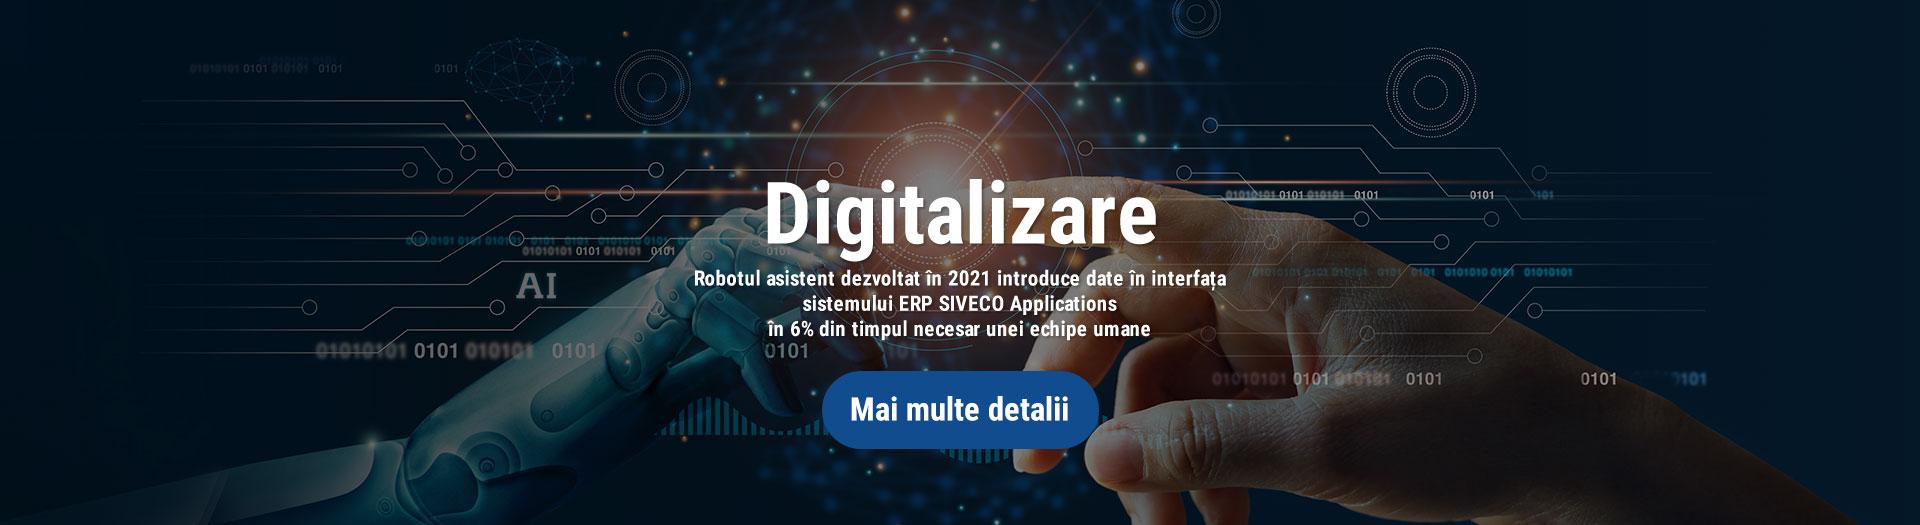 https://www.simavi.ro/digitalizare